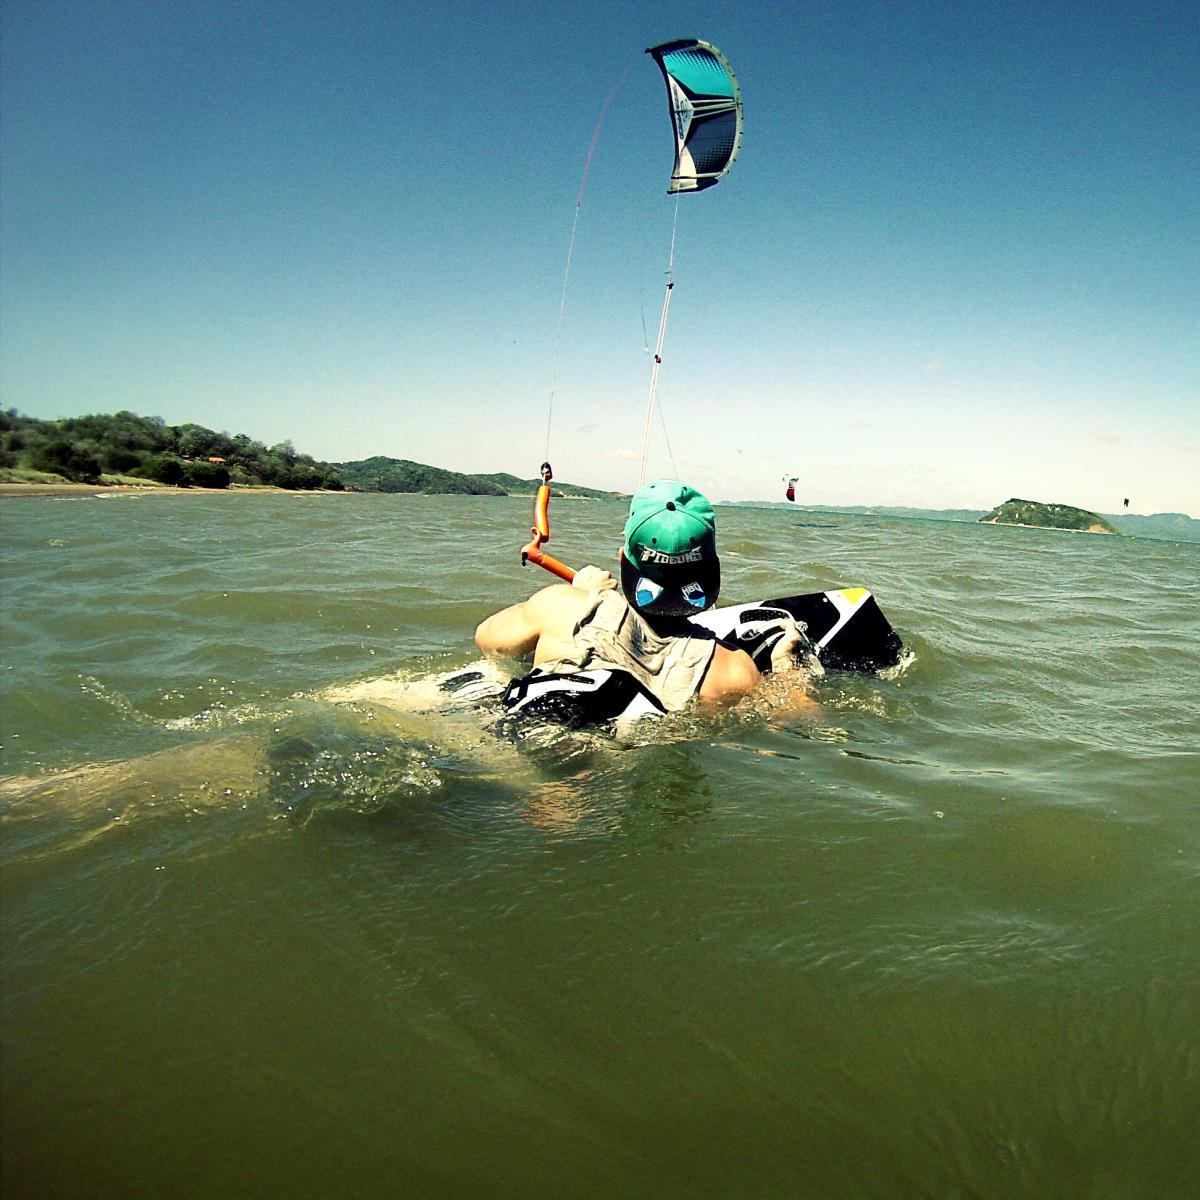 Kite Surfing Renesse Zeeland HD desktop wallpaper Widescreen